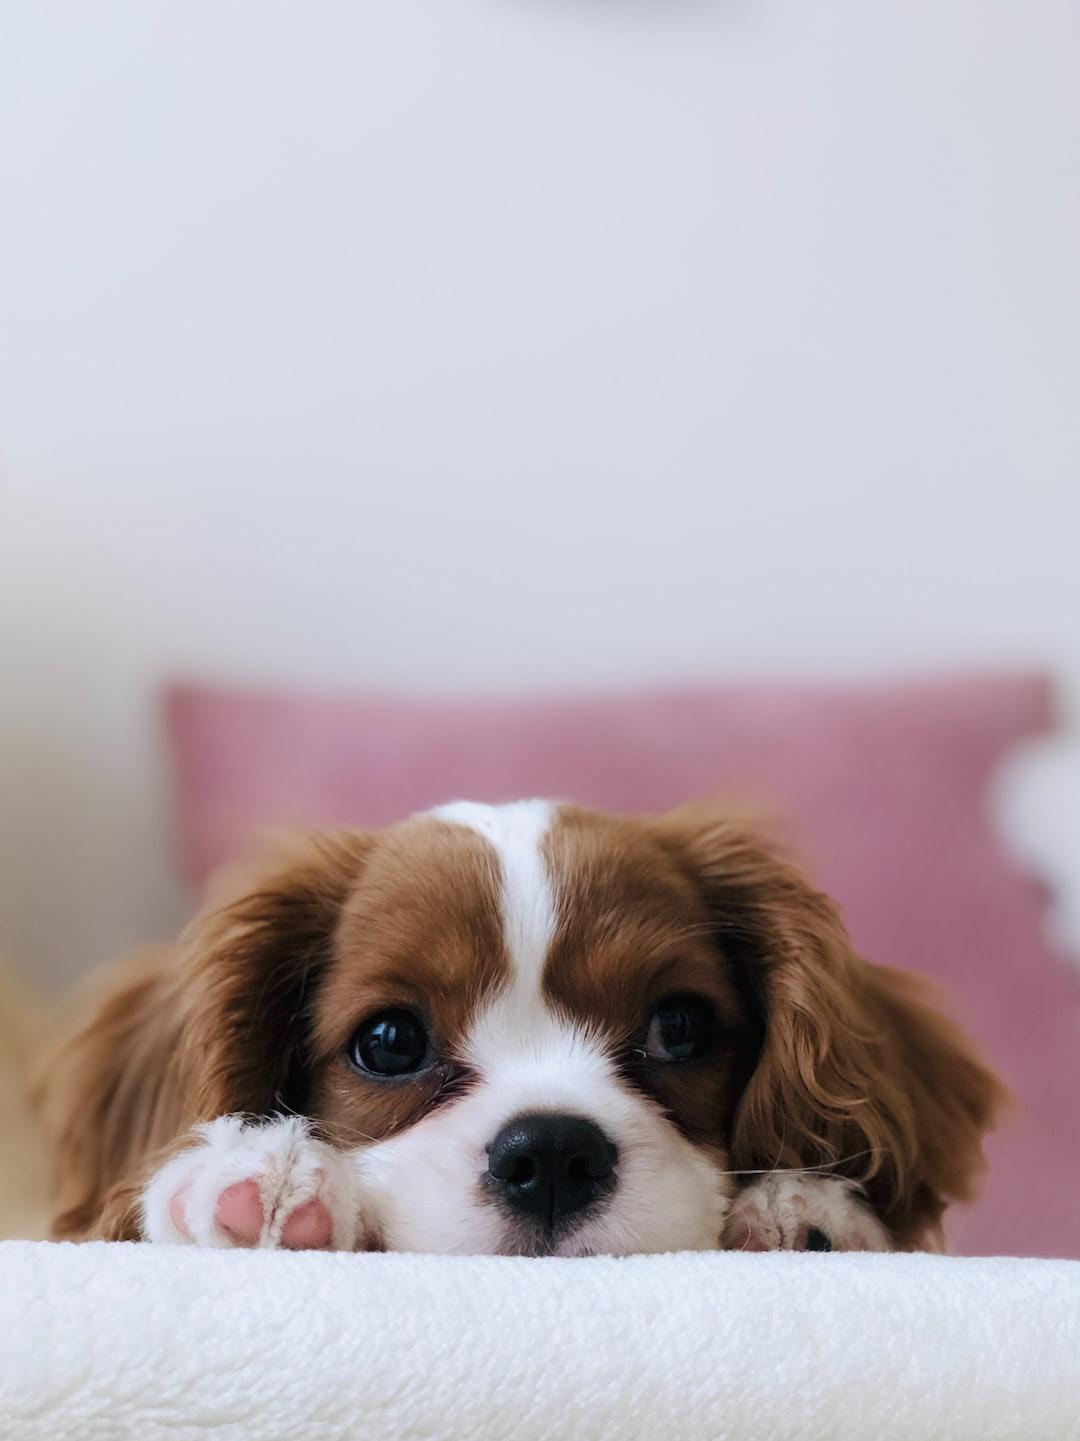 Puppy Wallpapers Free Hd Download 500 Hq Unsplash